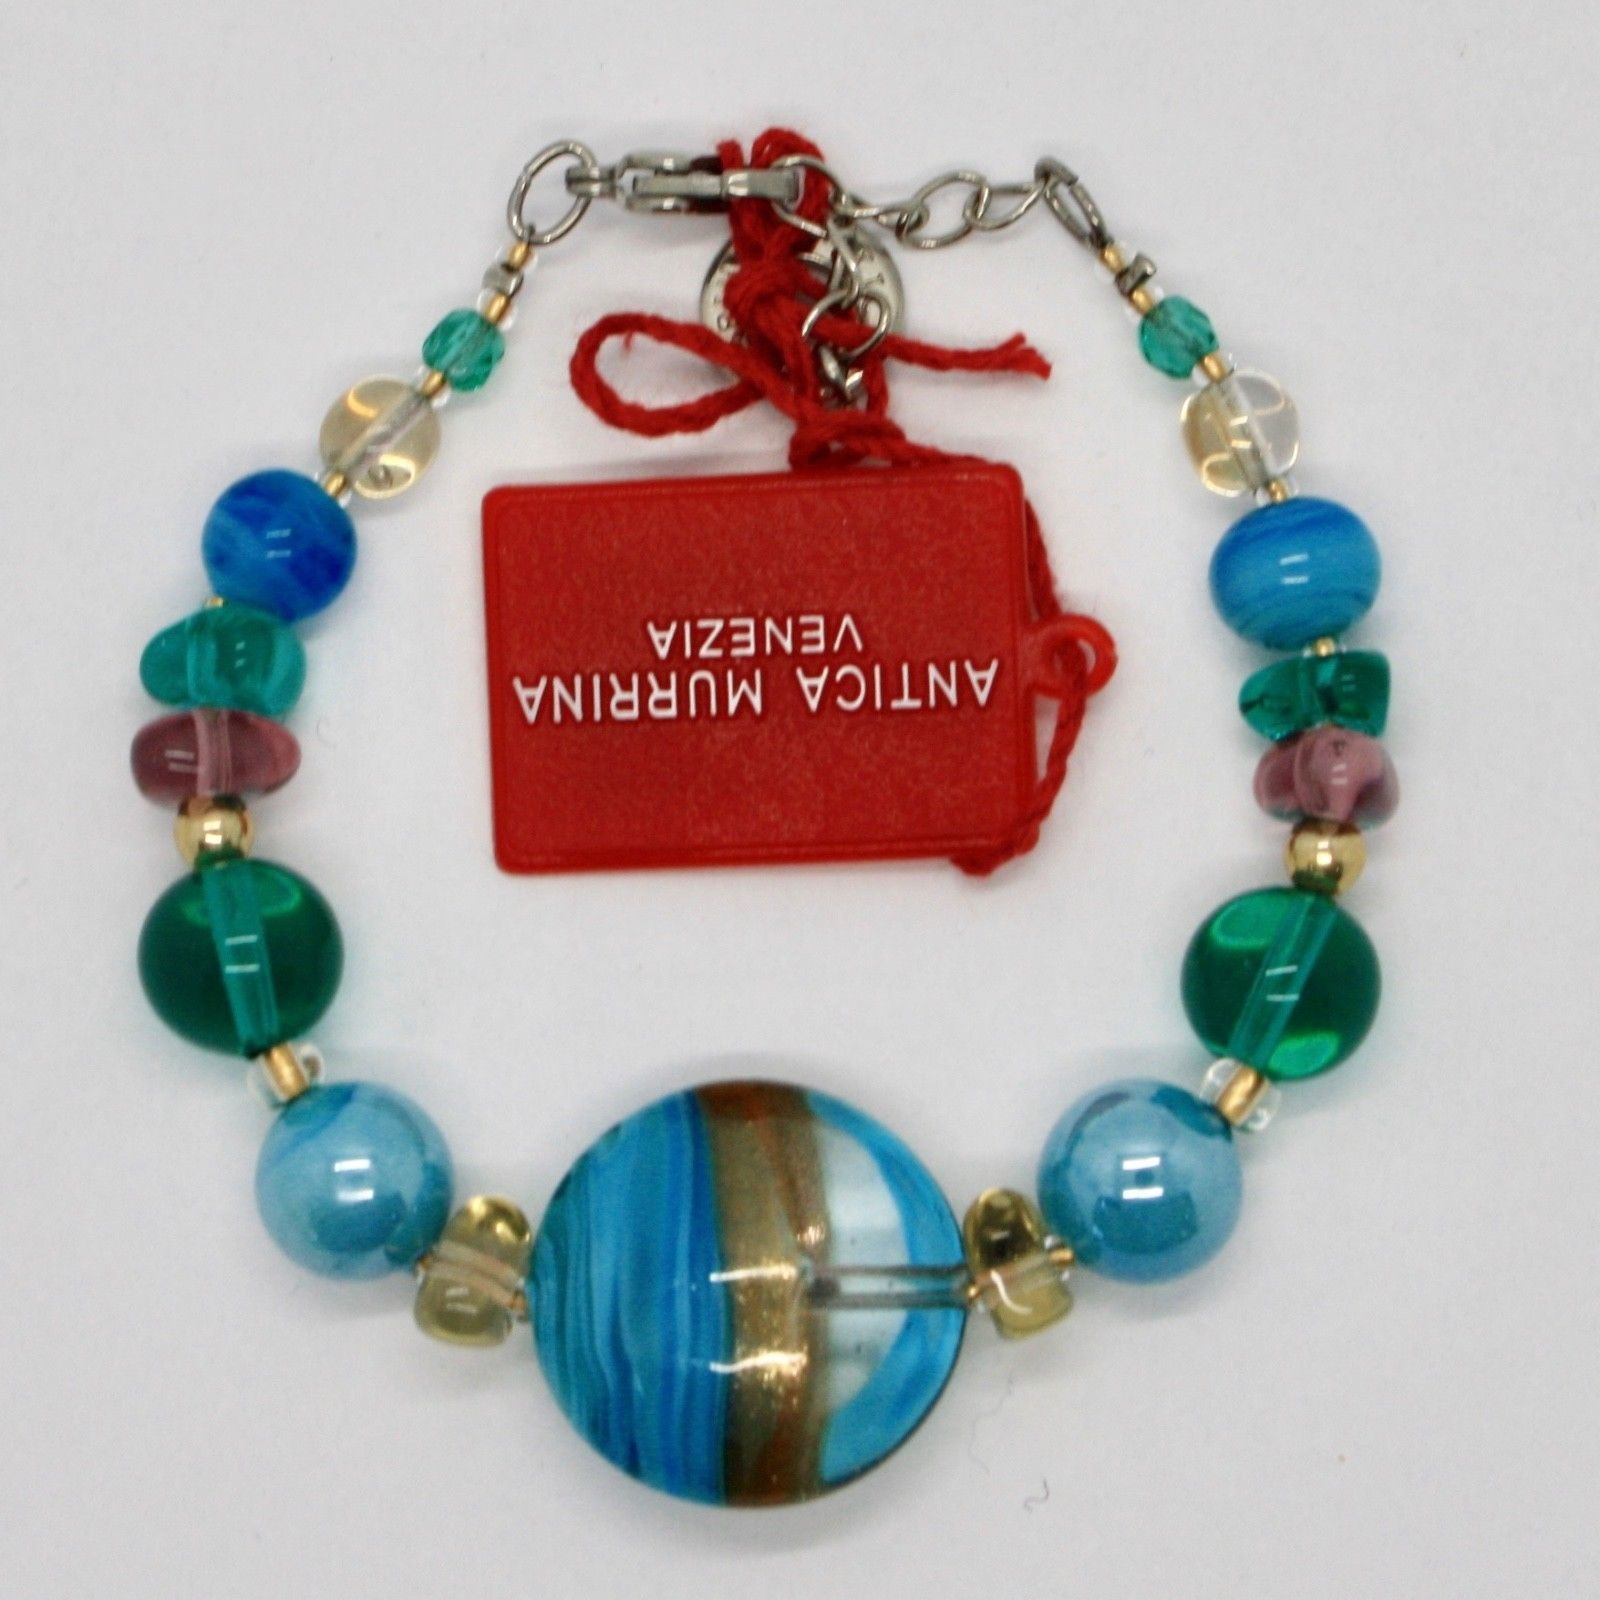 ARMBAND ANTICA MURRINA VENEZIA, MURANO-GLAS GELB BLAU TÜRKIS BR761A07